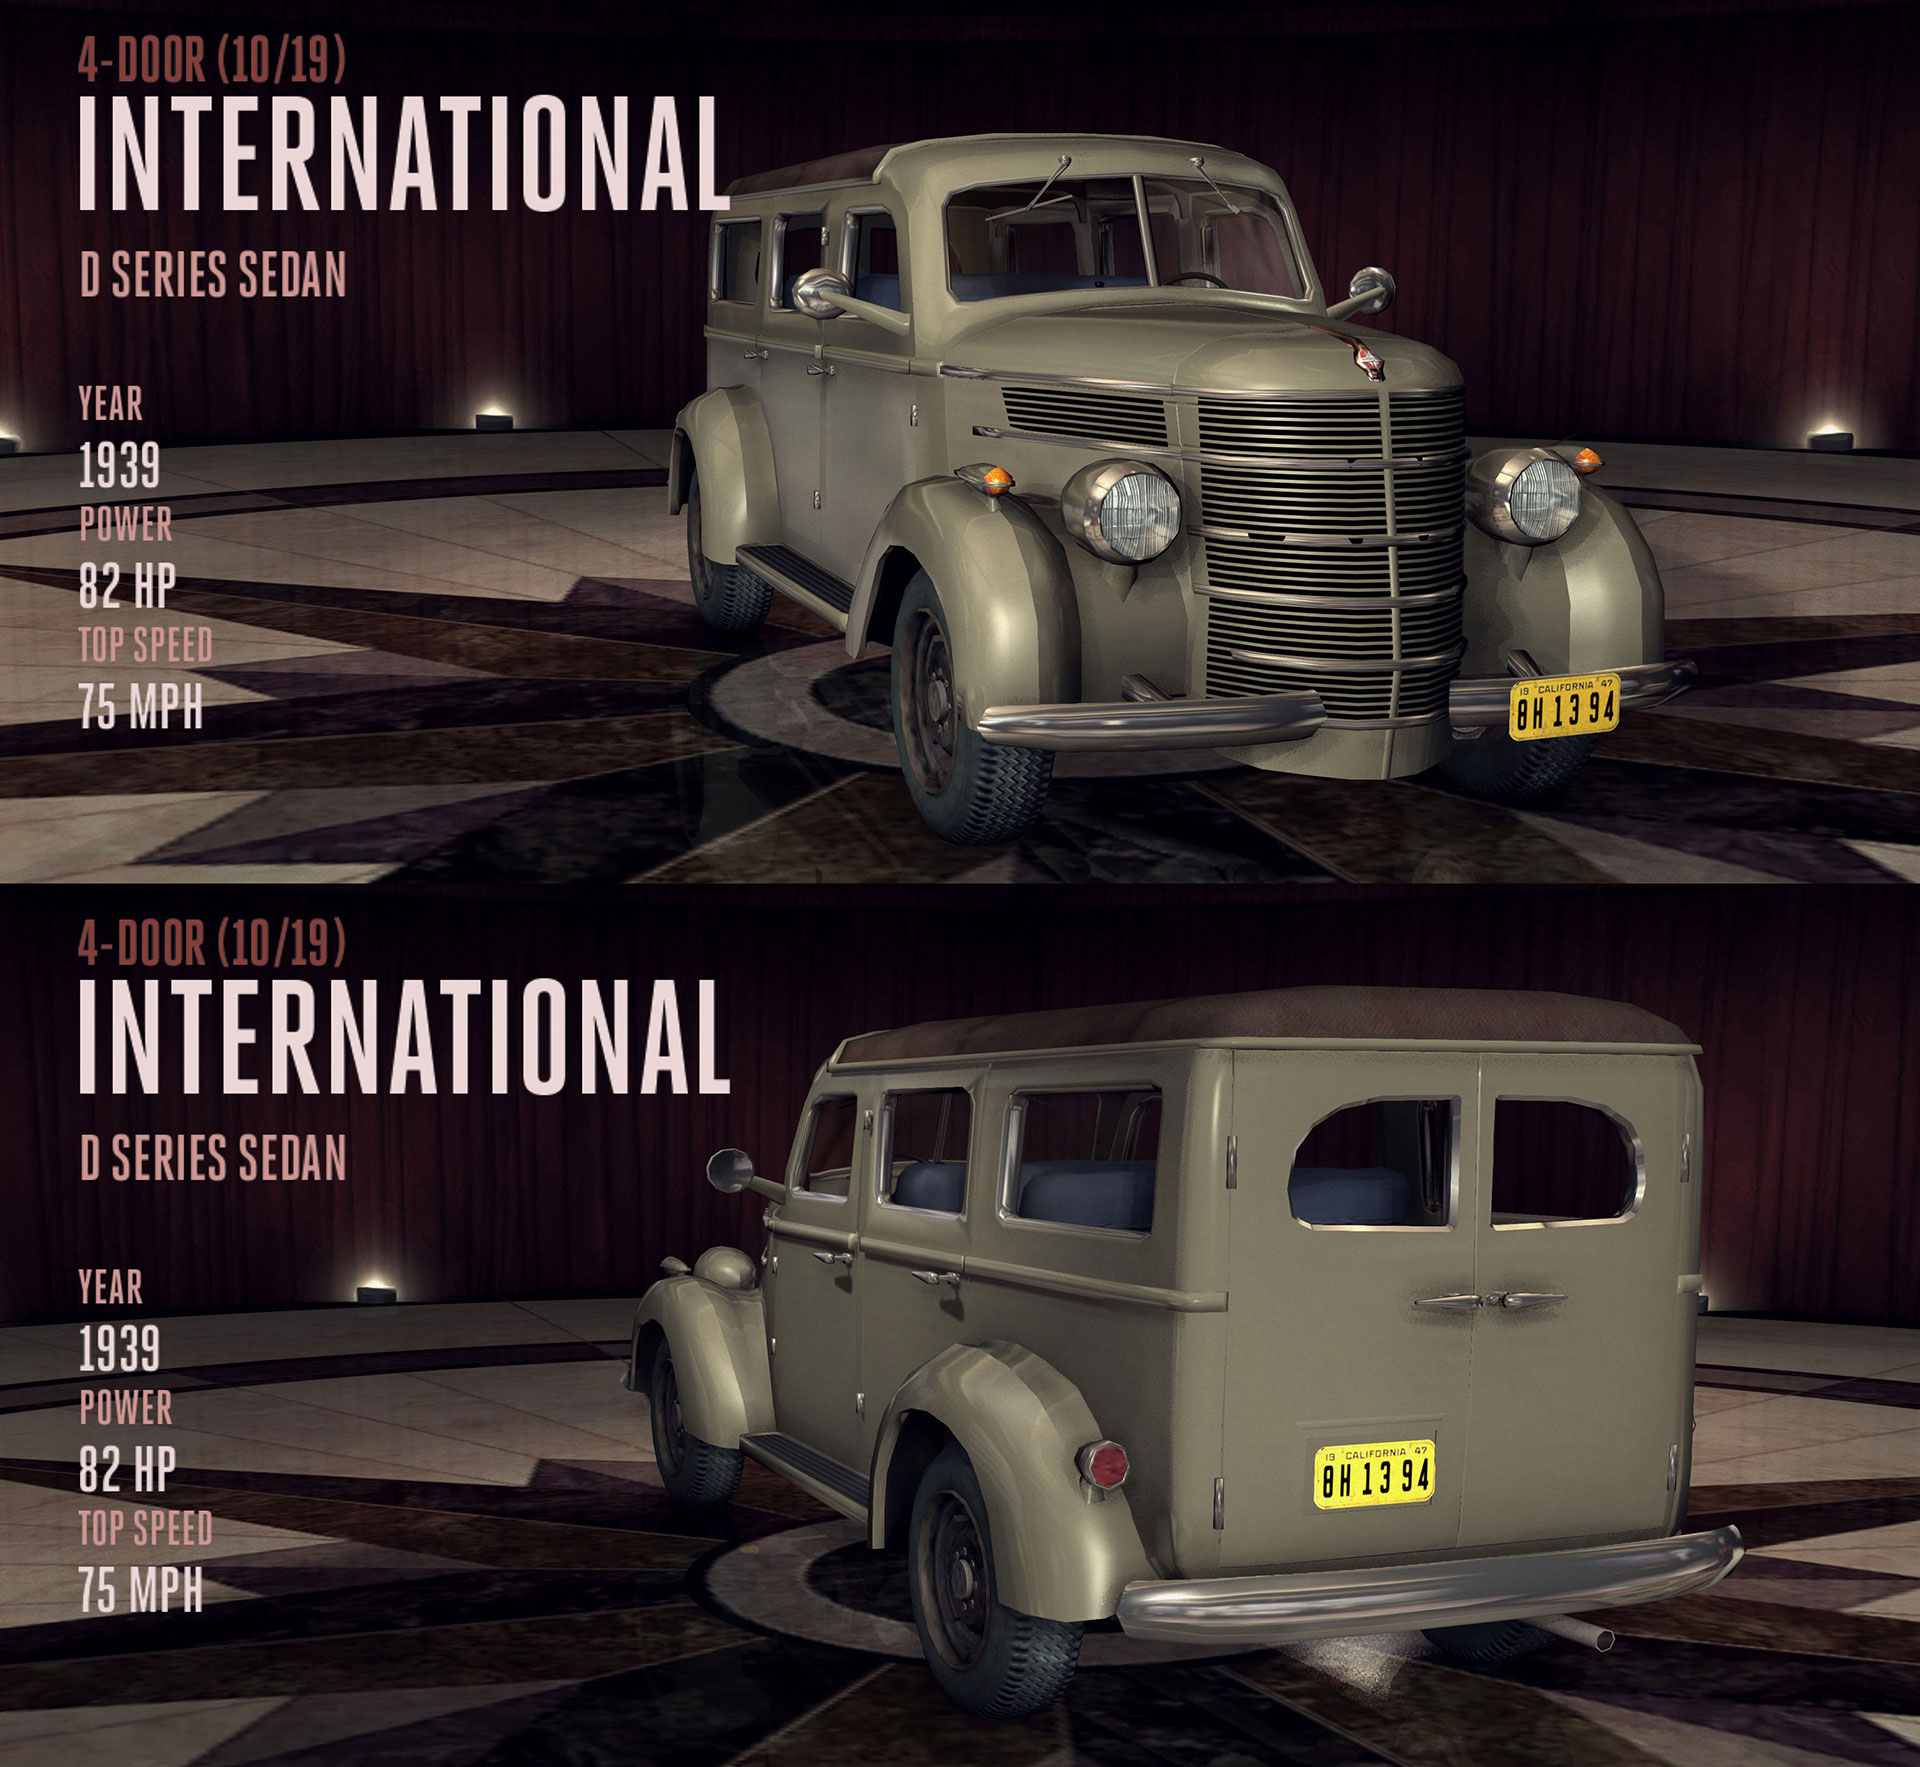 International D Series Sedan